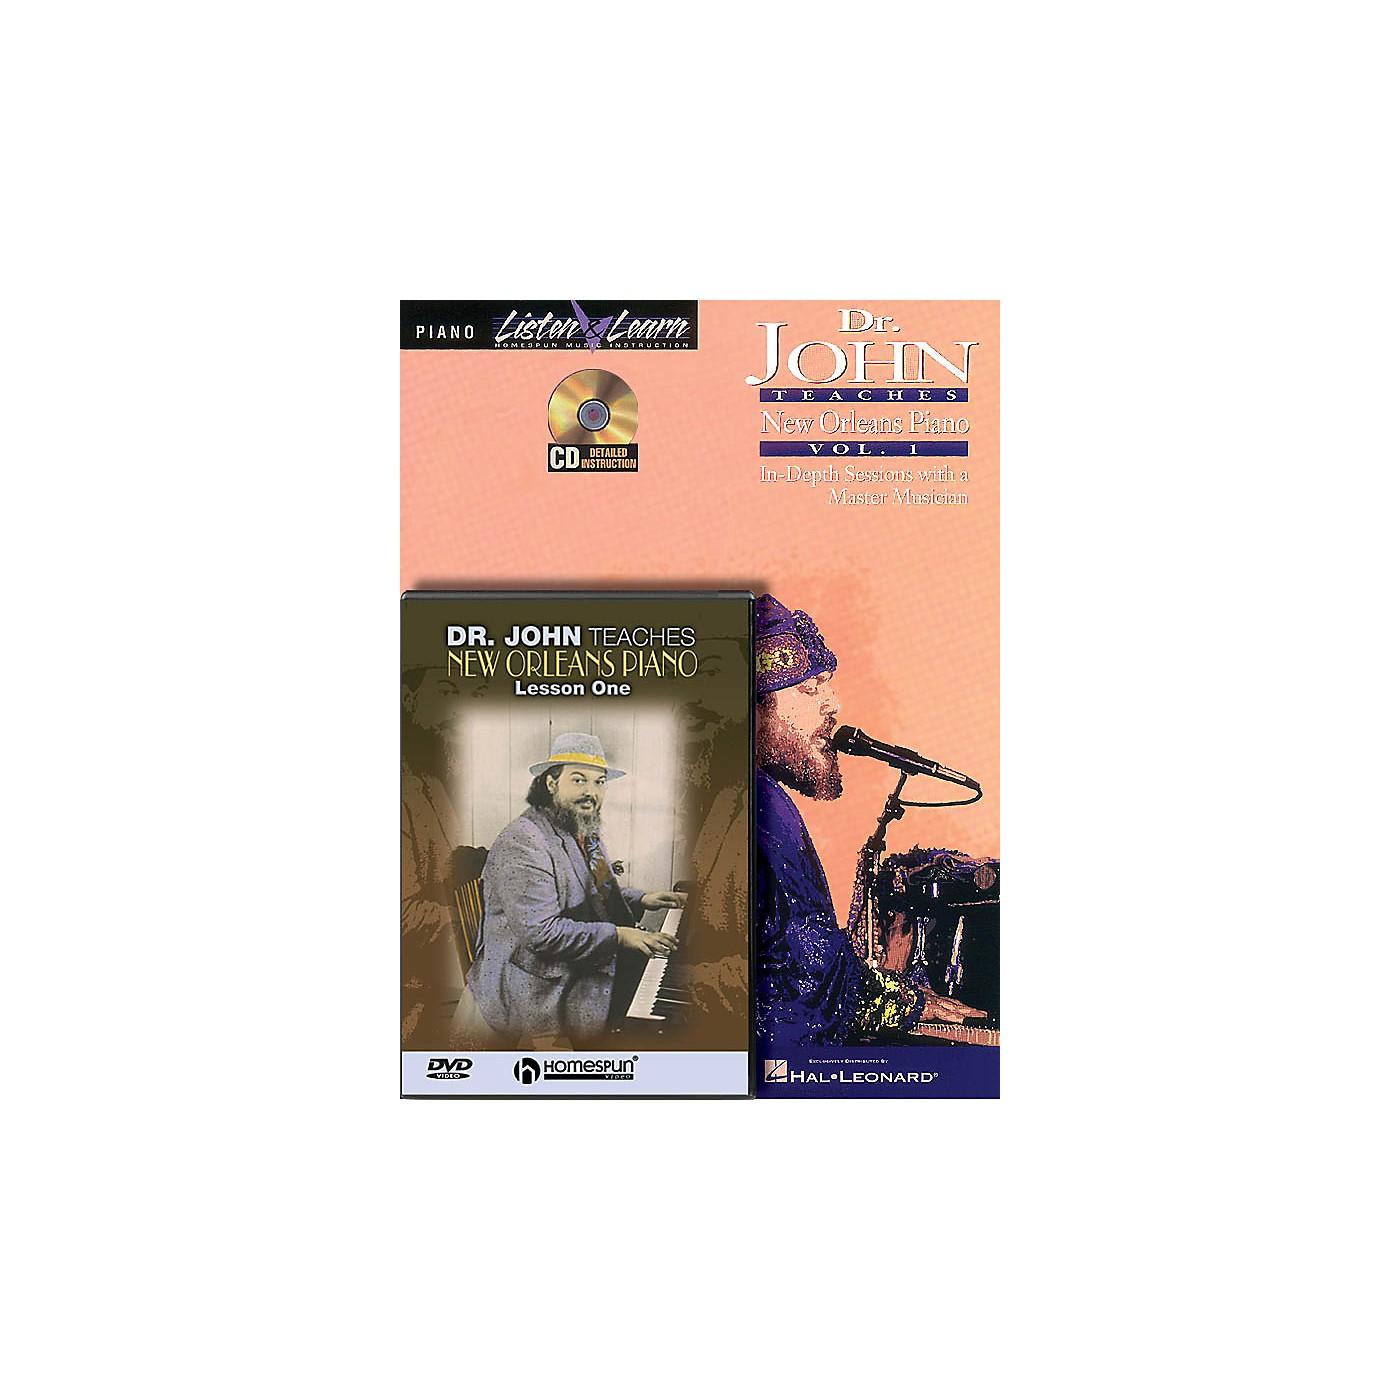 Homespun Dr. John - Piano Bundle Pack Homespun Tapes Series Softcover with DVD Written by Dr. John Rebennack thumbnail